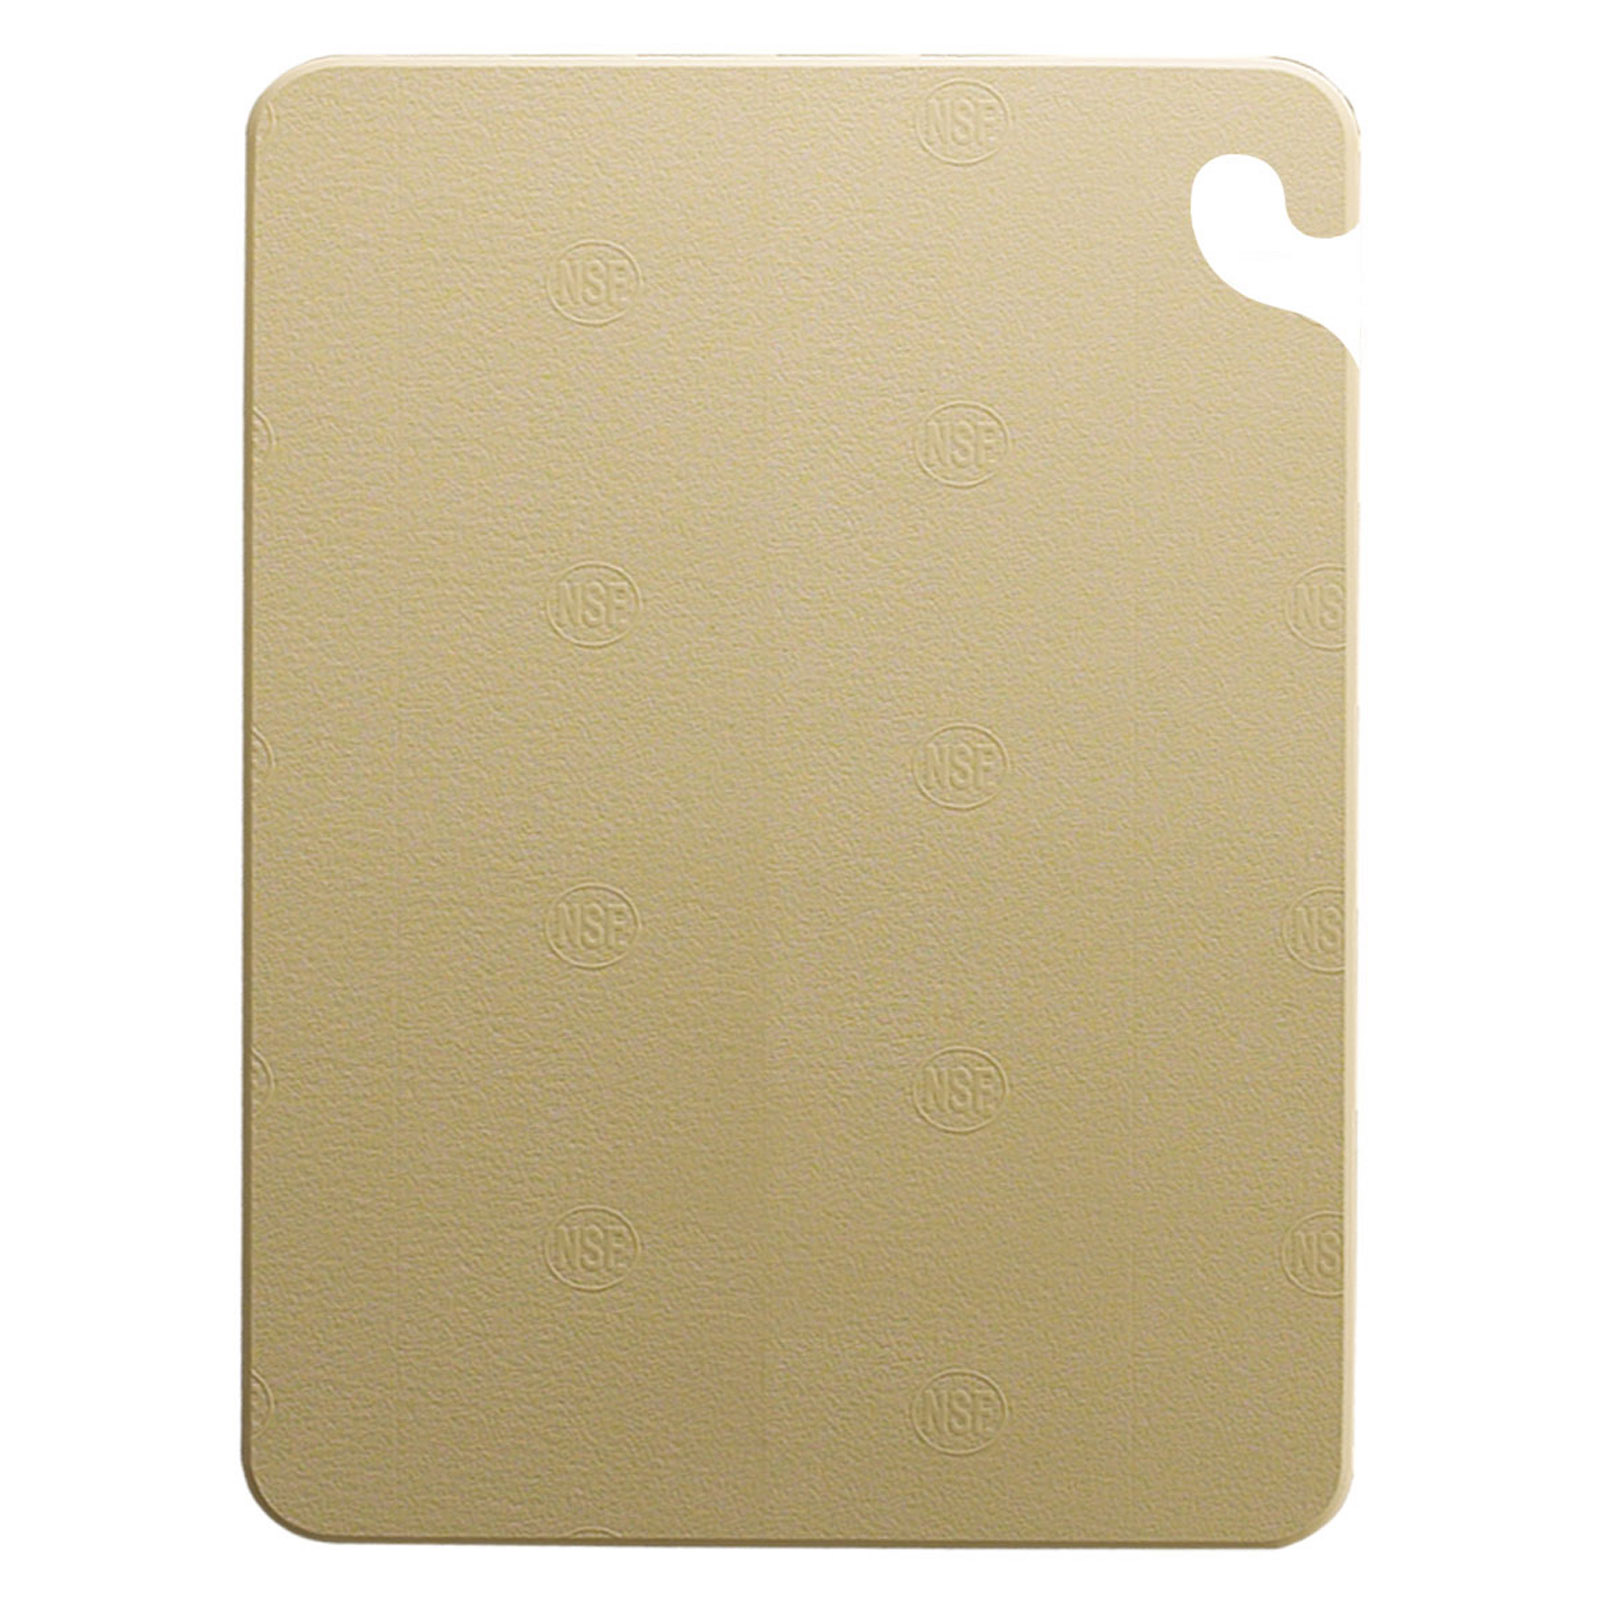 San Jamar CB152012BR cutting board, plastic